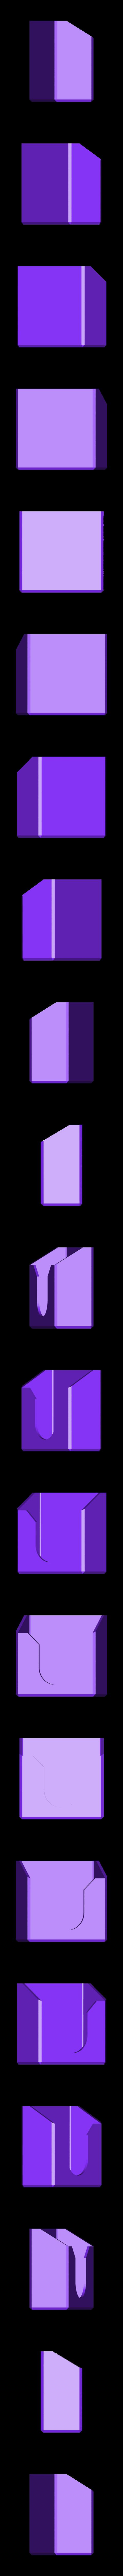 Dispenser_Backzutaten.stl Download free STL file Dispenser for ingredients - Kitchen • 3D printer template, ewap